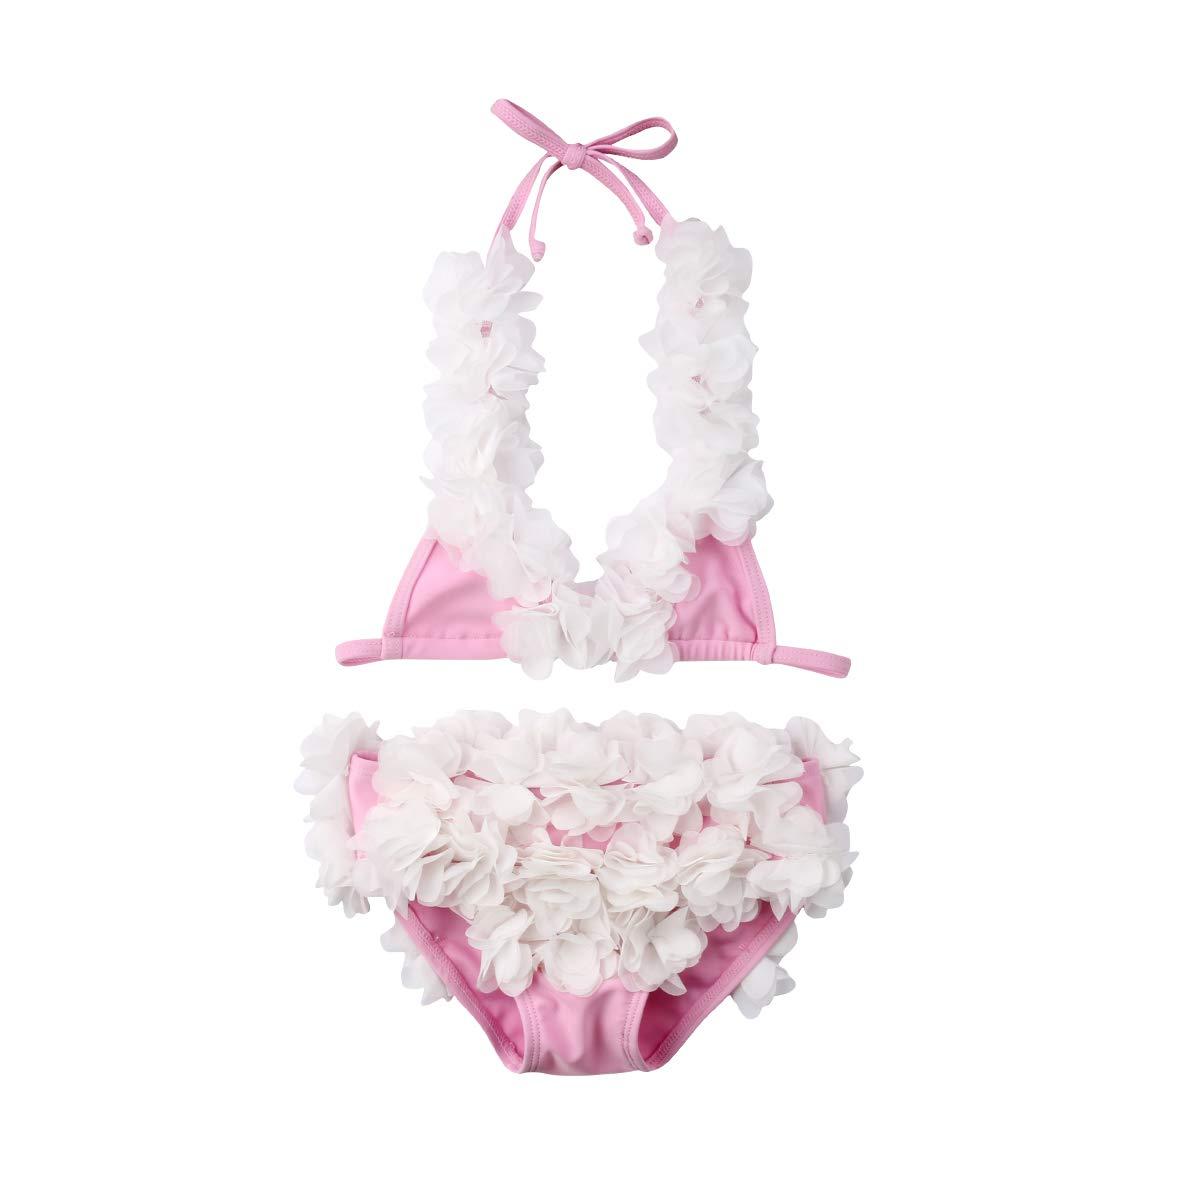 Douhoow SWIMWEAR ベビーガールズ 6-12 Months Pink&white B07MTLNMJY